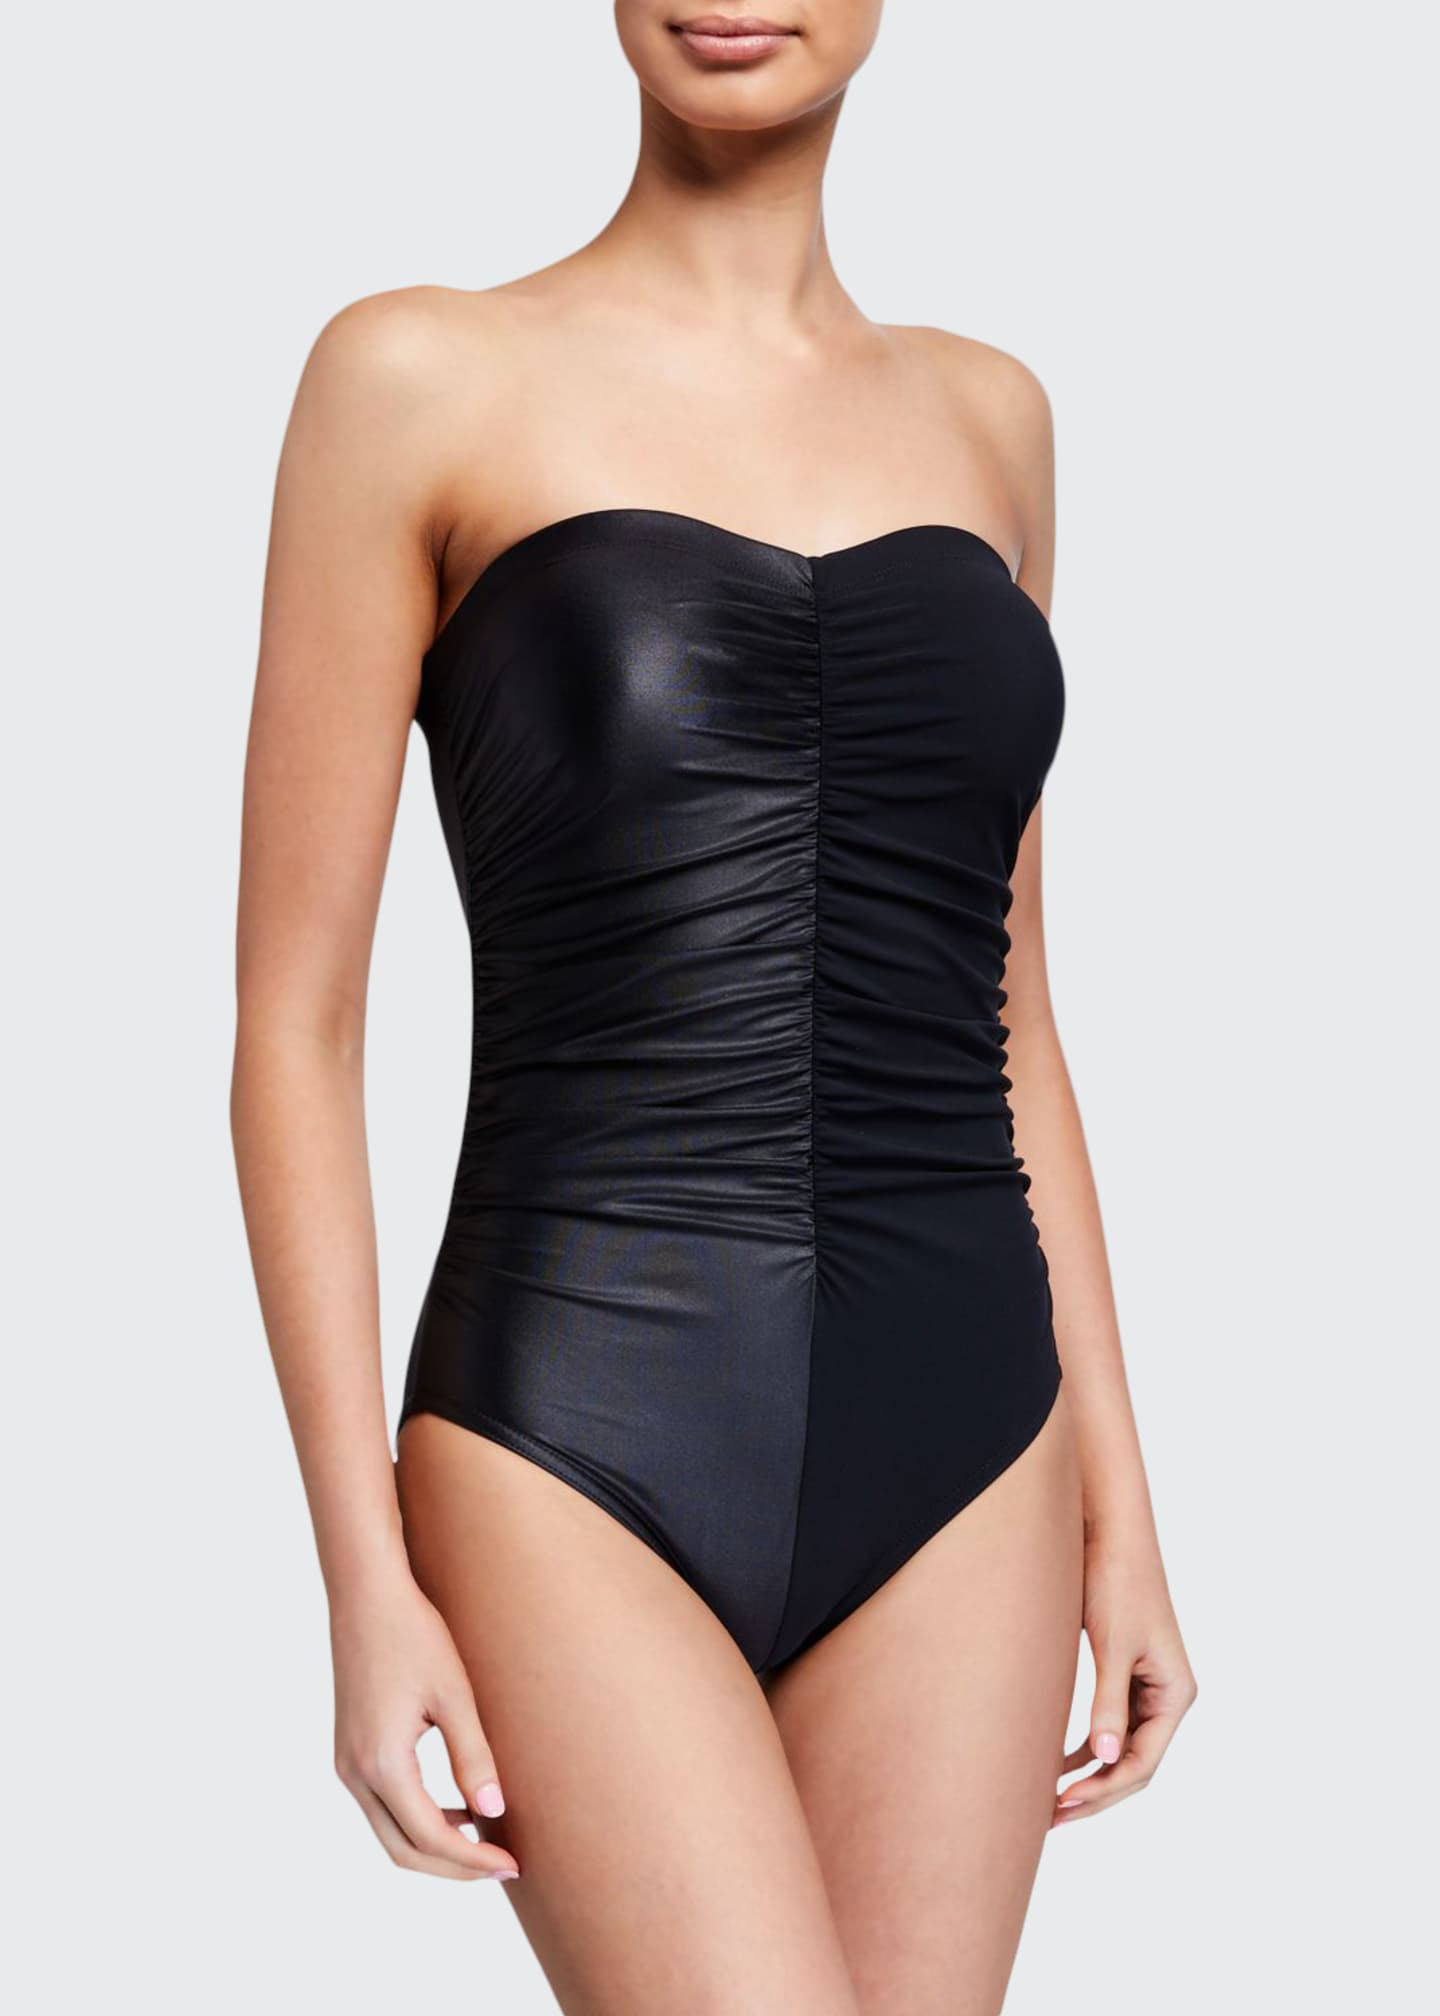 Karla Colletto Isla Bandeau One-Piece Swimsuit with Shelf